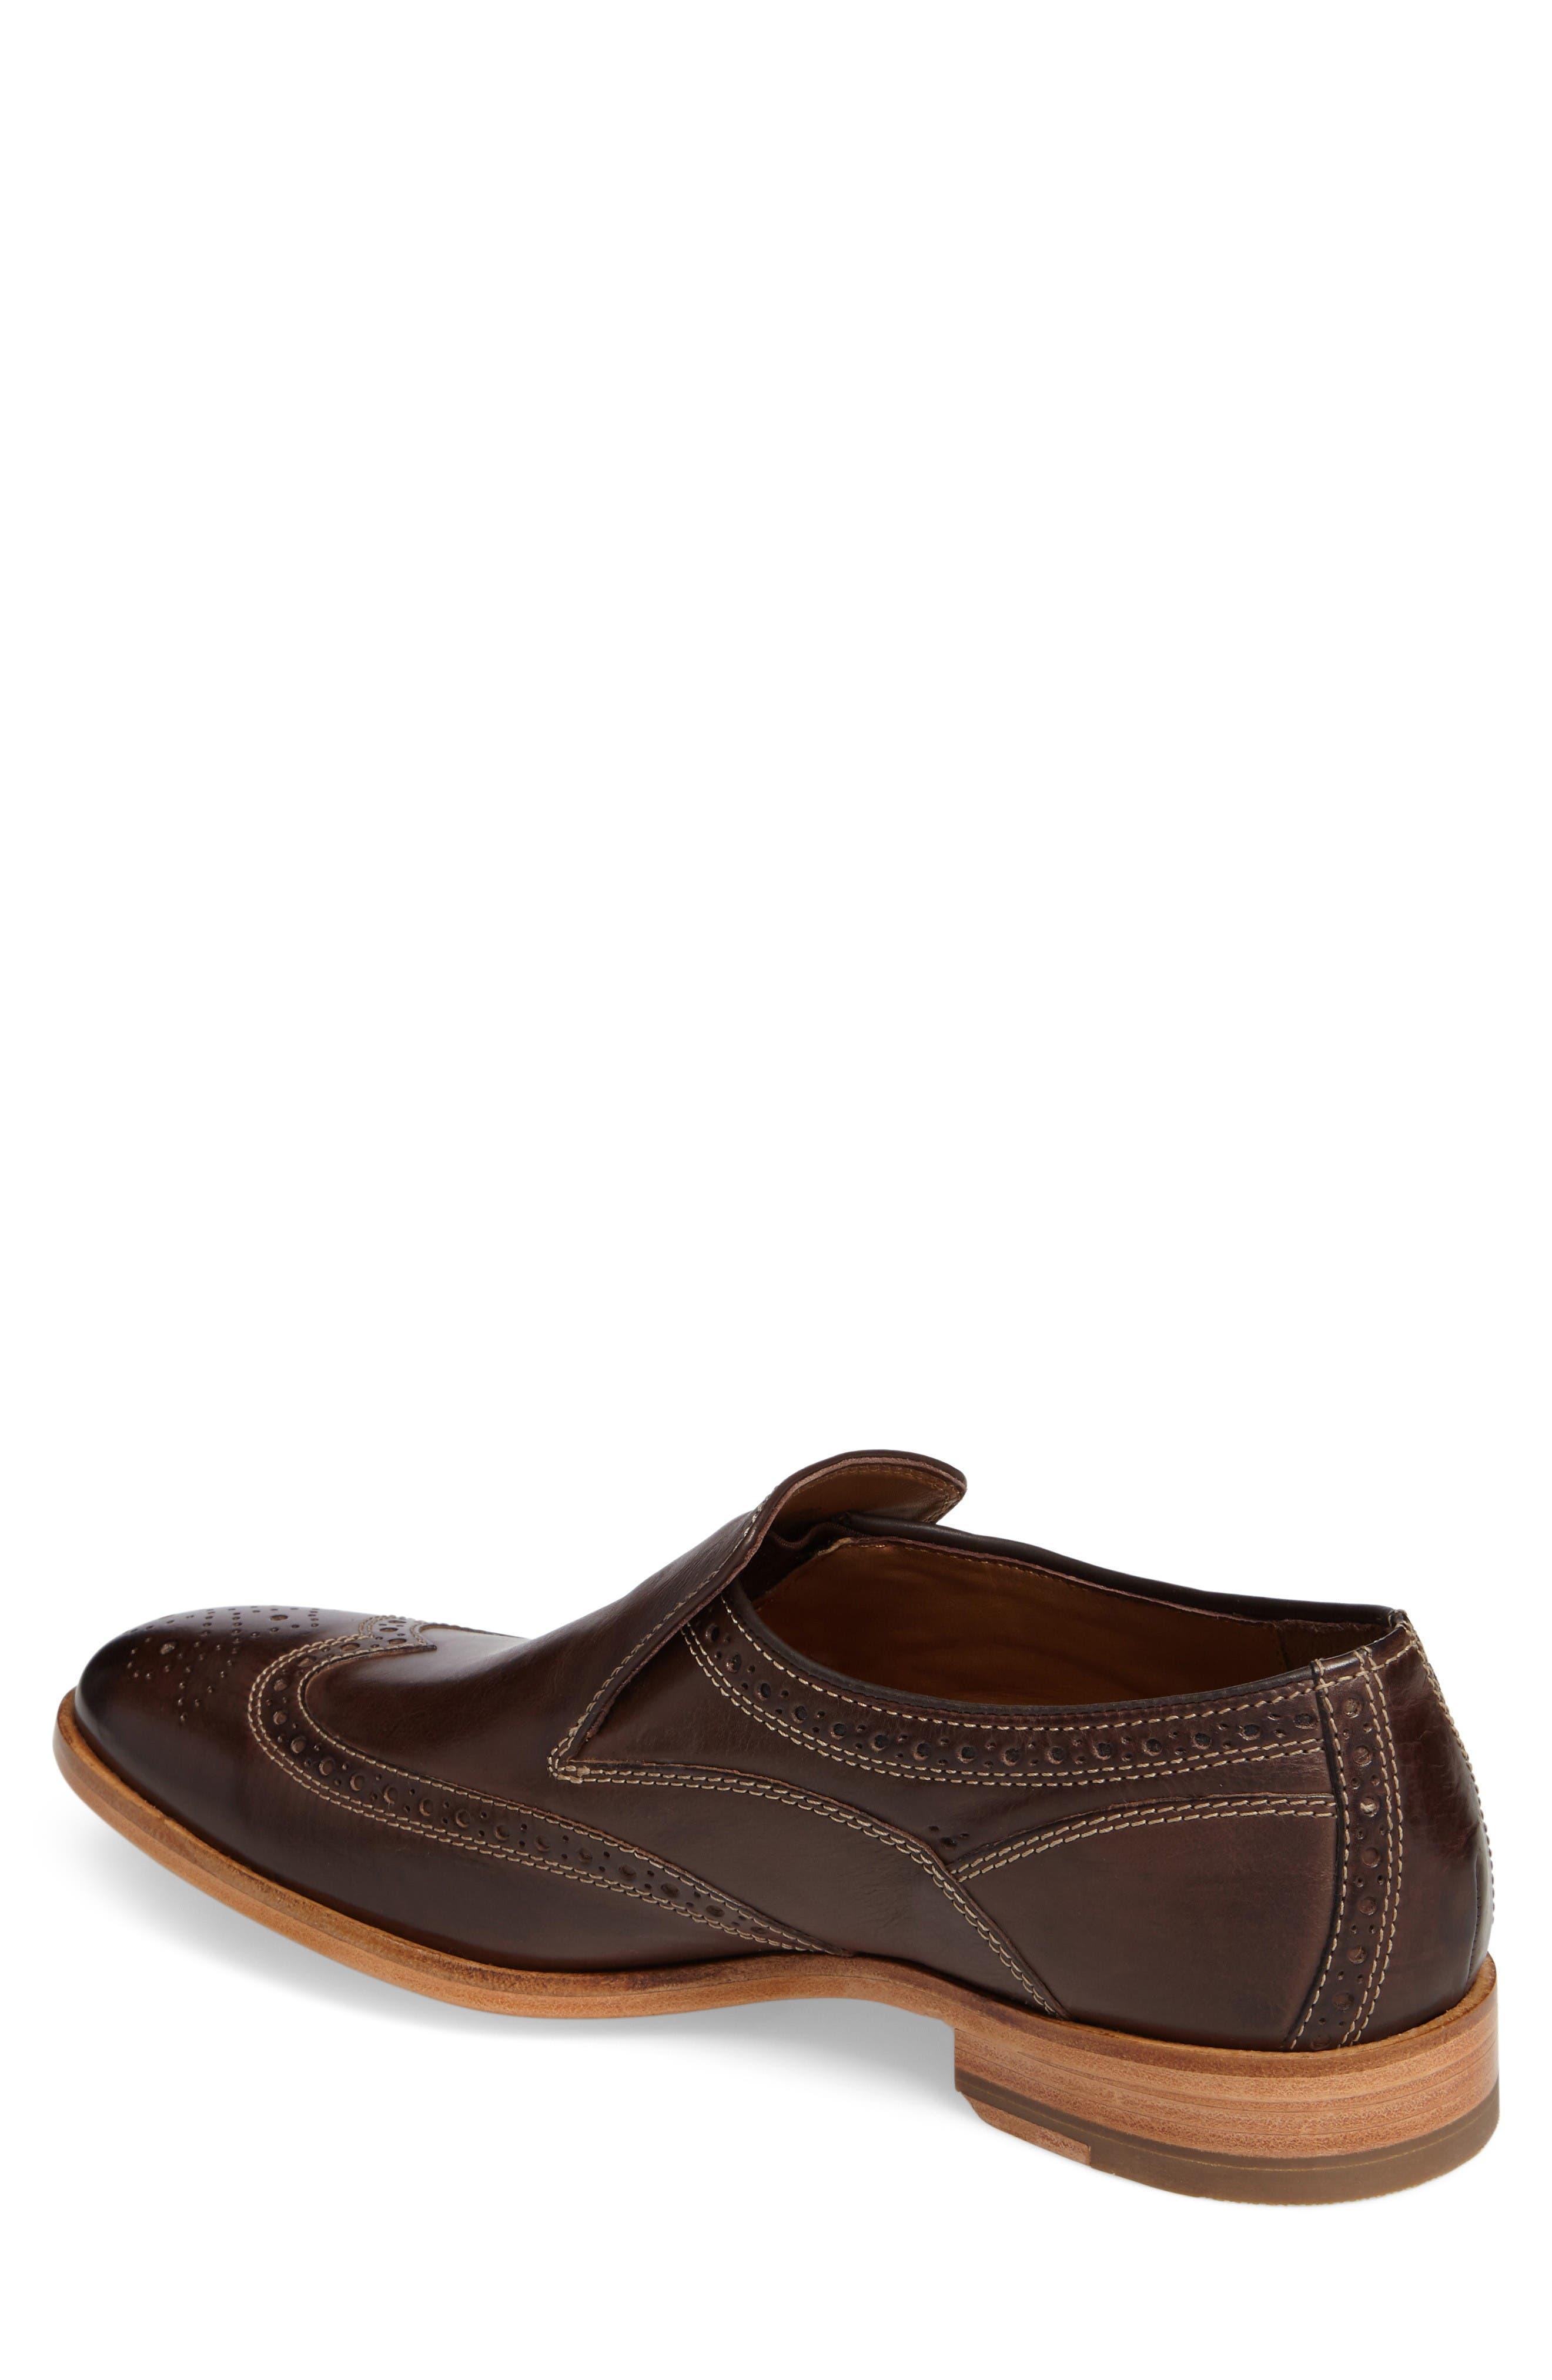 Graham Wingtip Loafer,                             Alternate thumbnail 2, color,                             Dark Brown Calfskin Leather